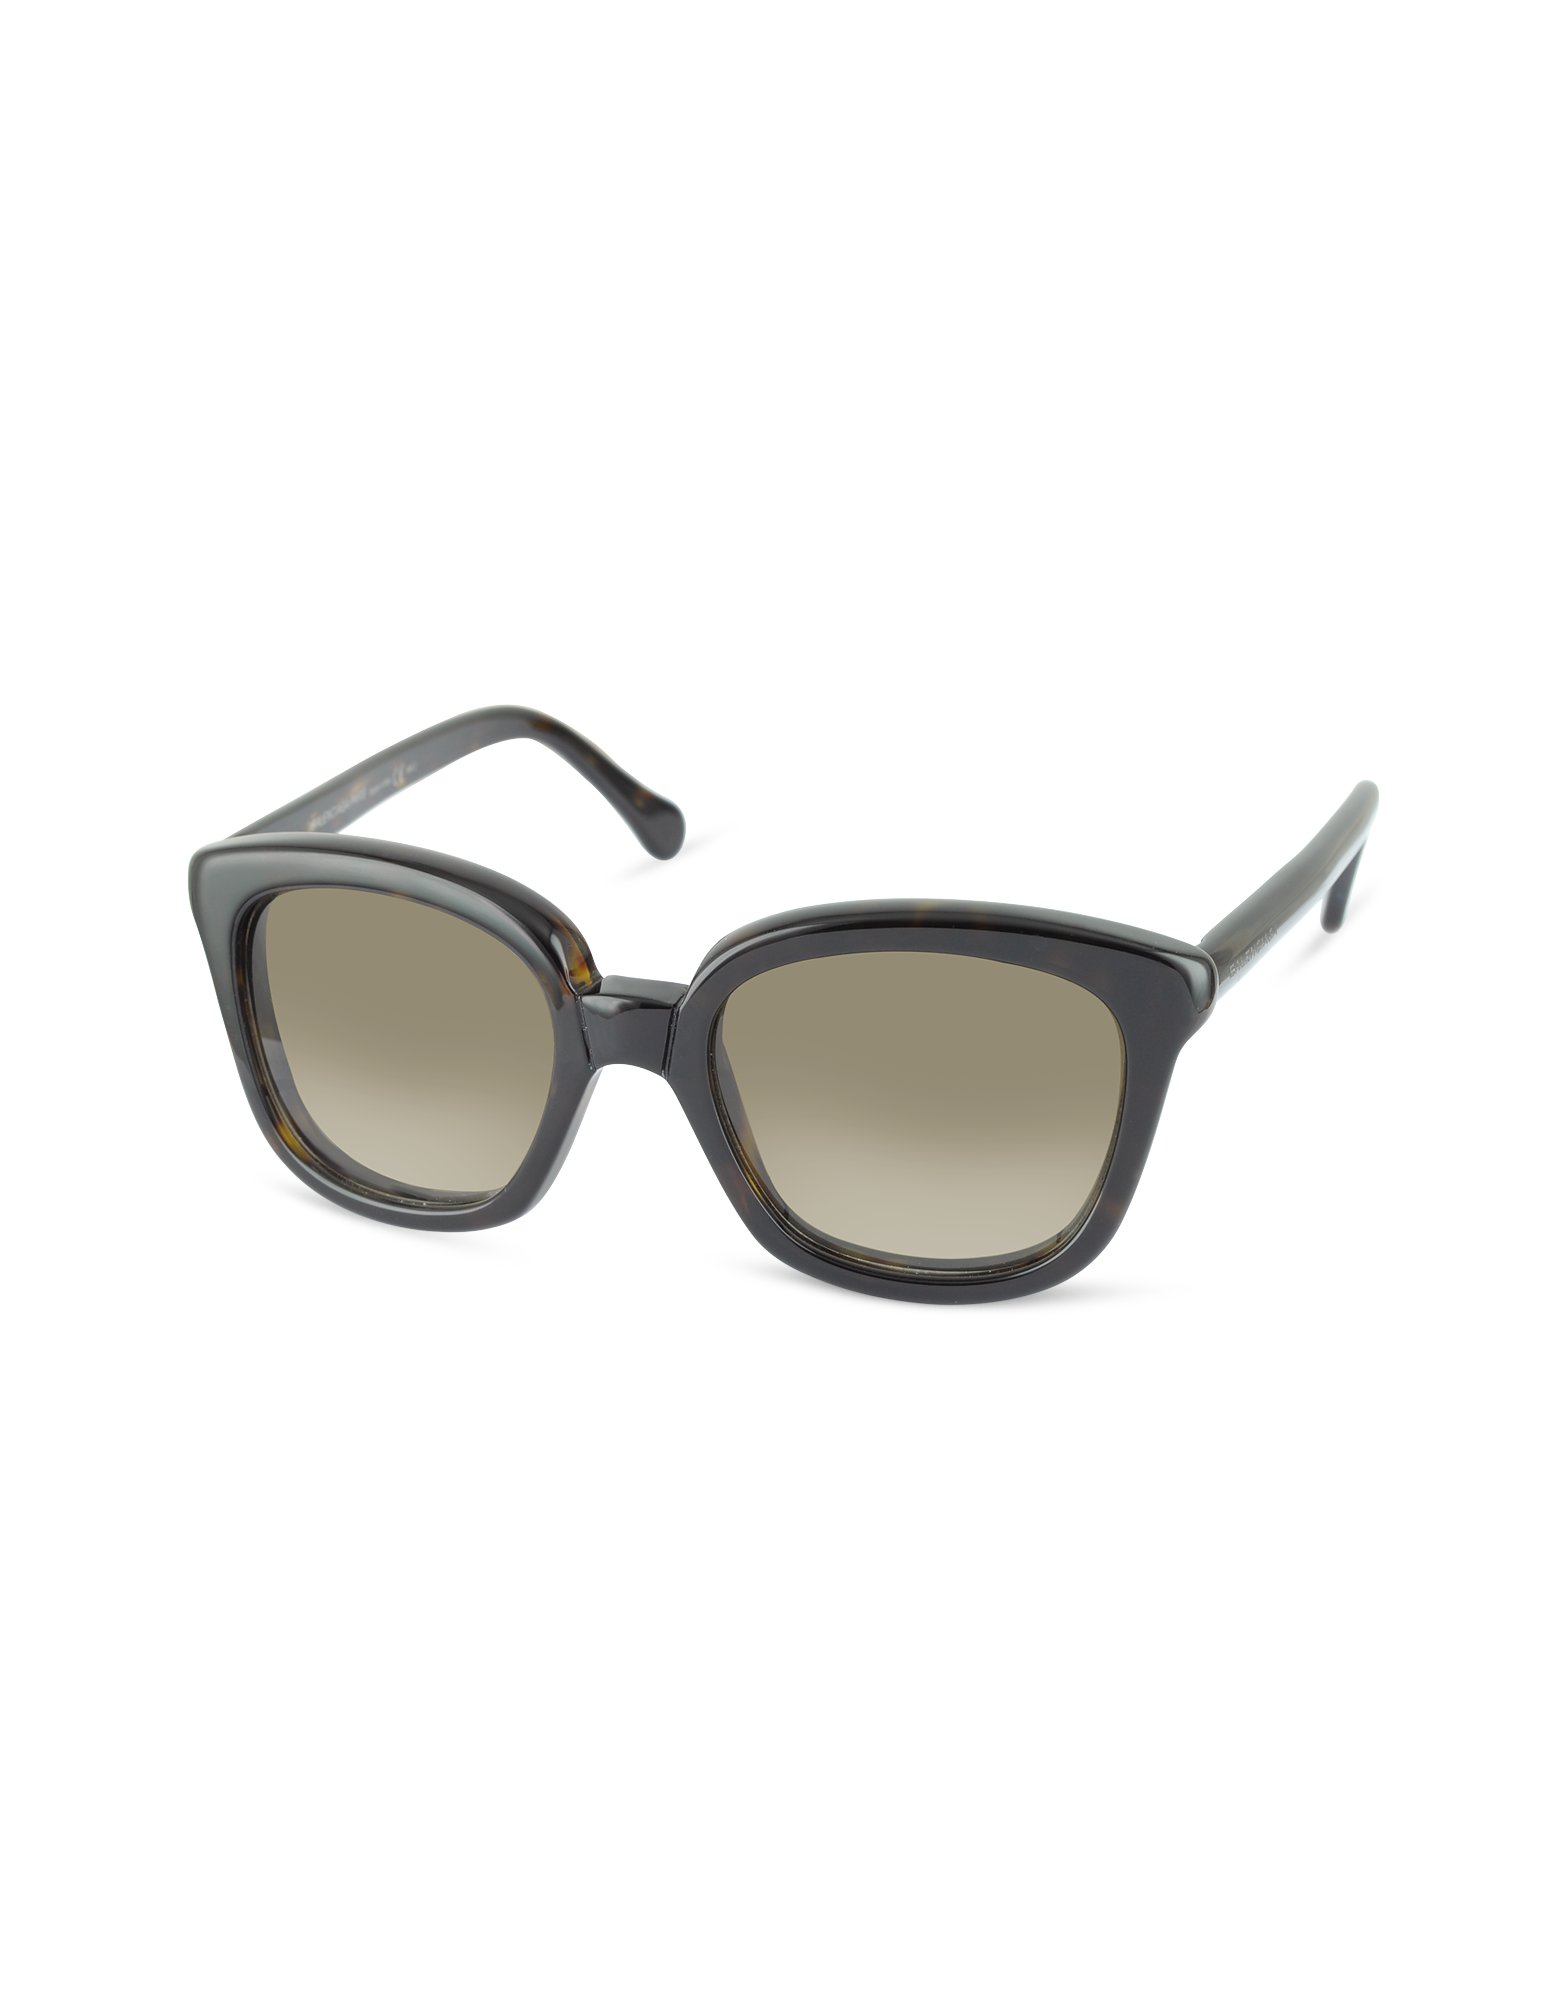 68f0bb2bcd0 Chloe Dallia Sunglasses